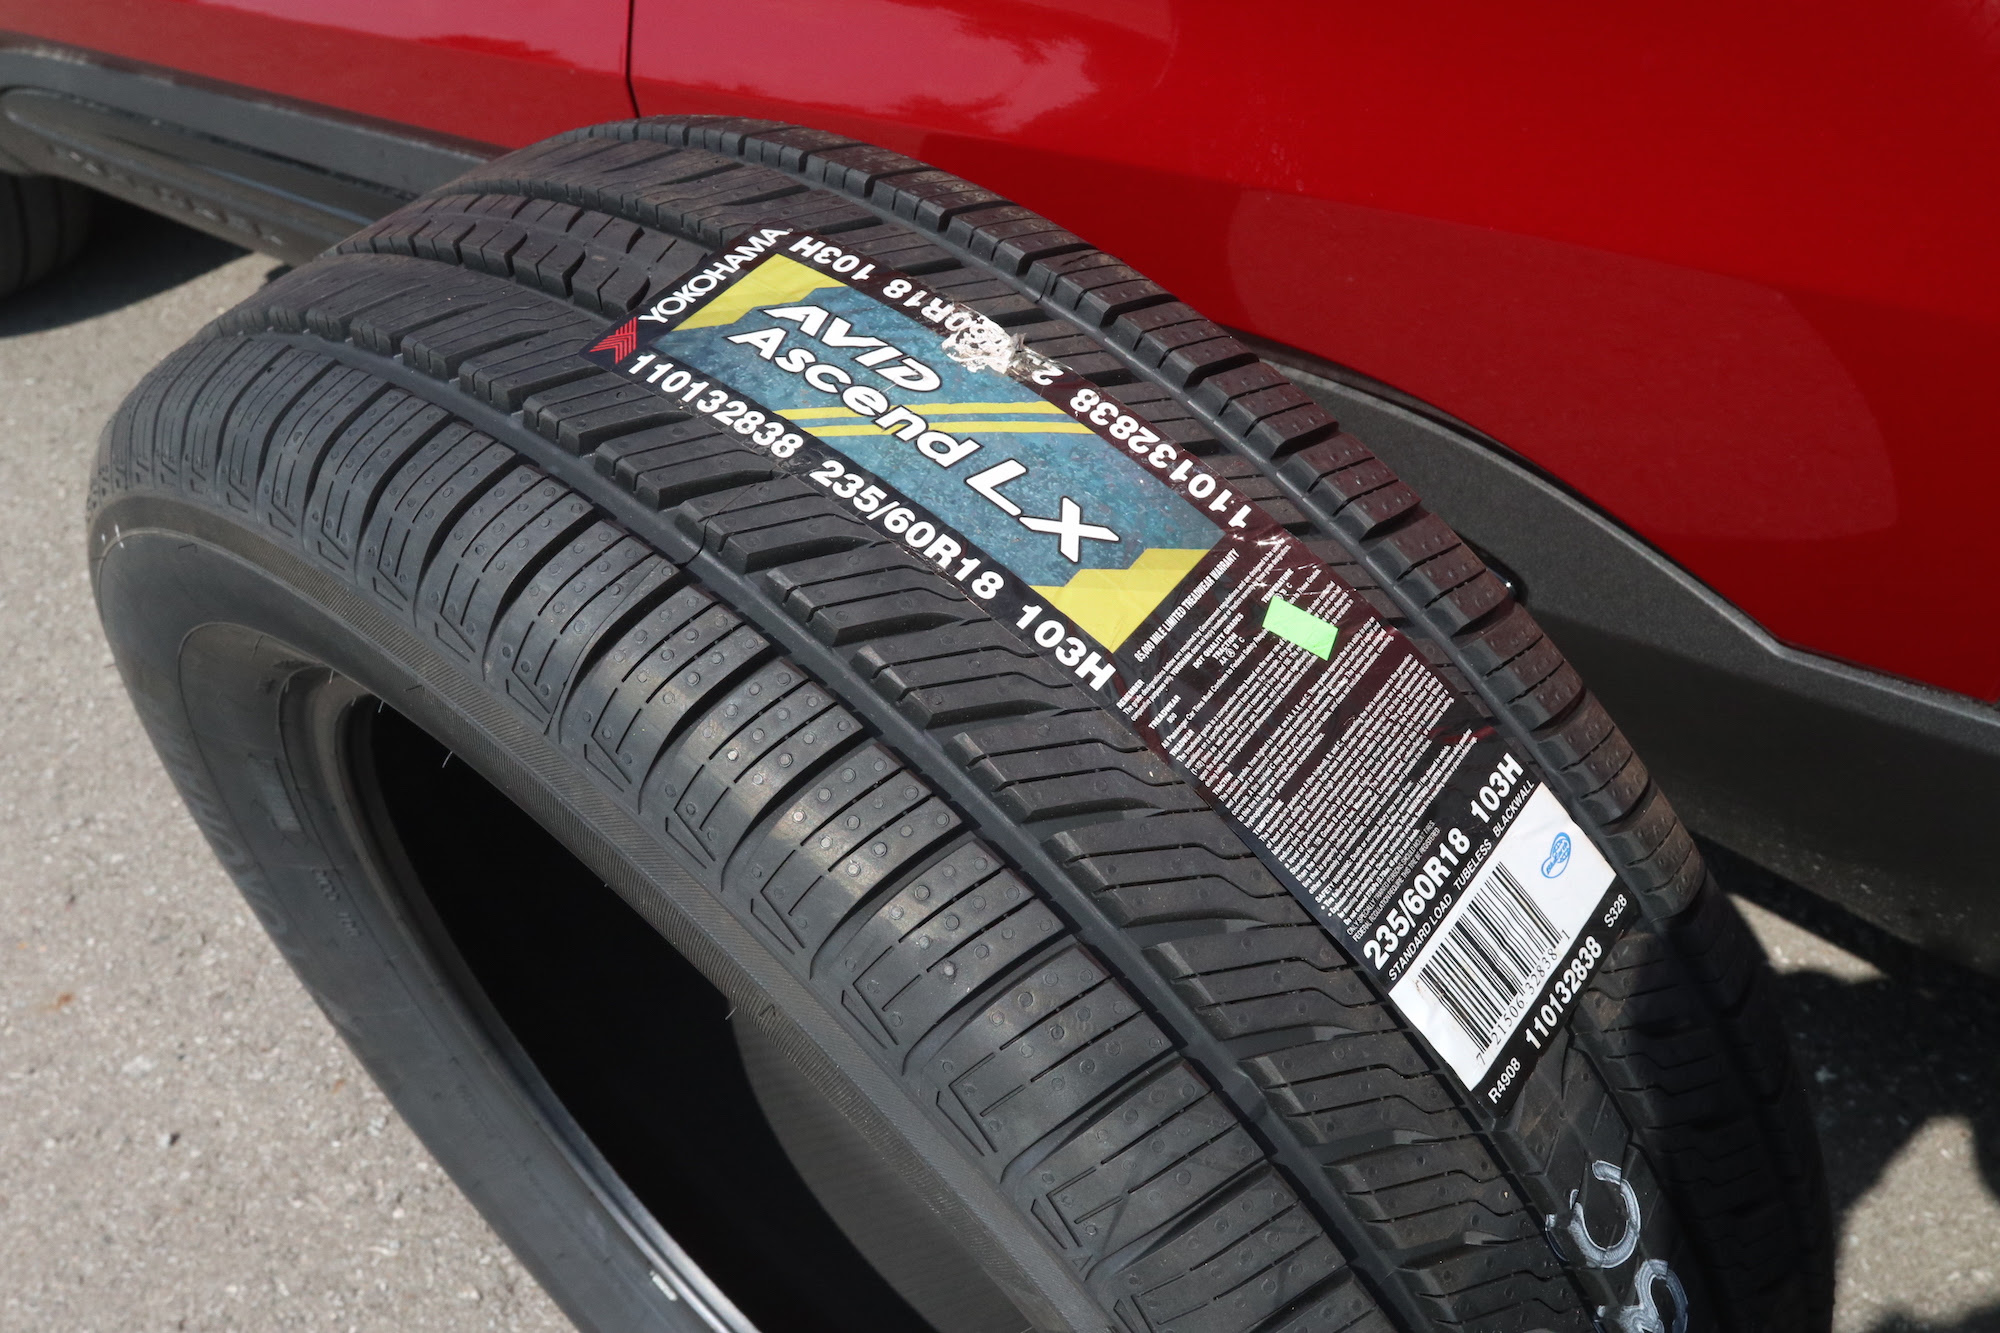 Review: Yokohama Avid Ascend LX All-Season Tires | Canadian Auto Review